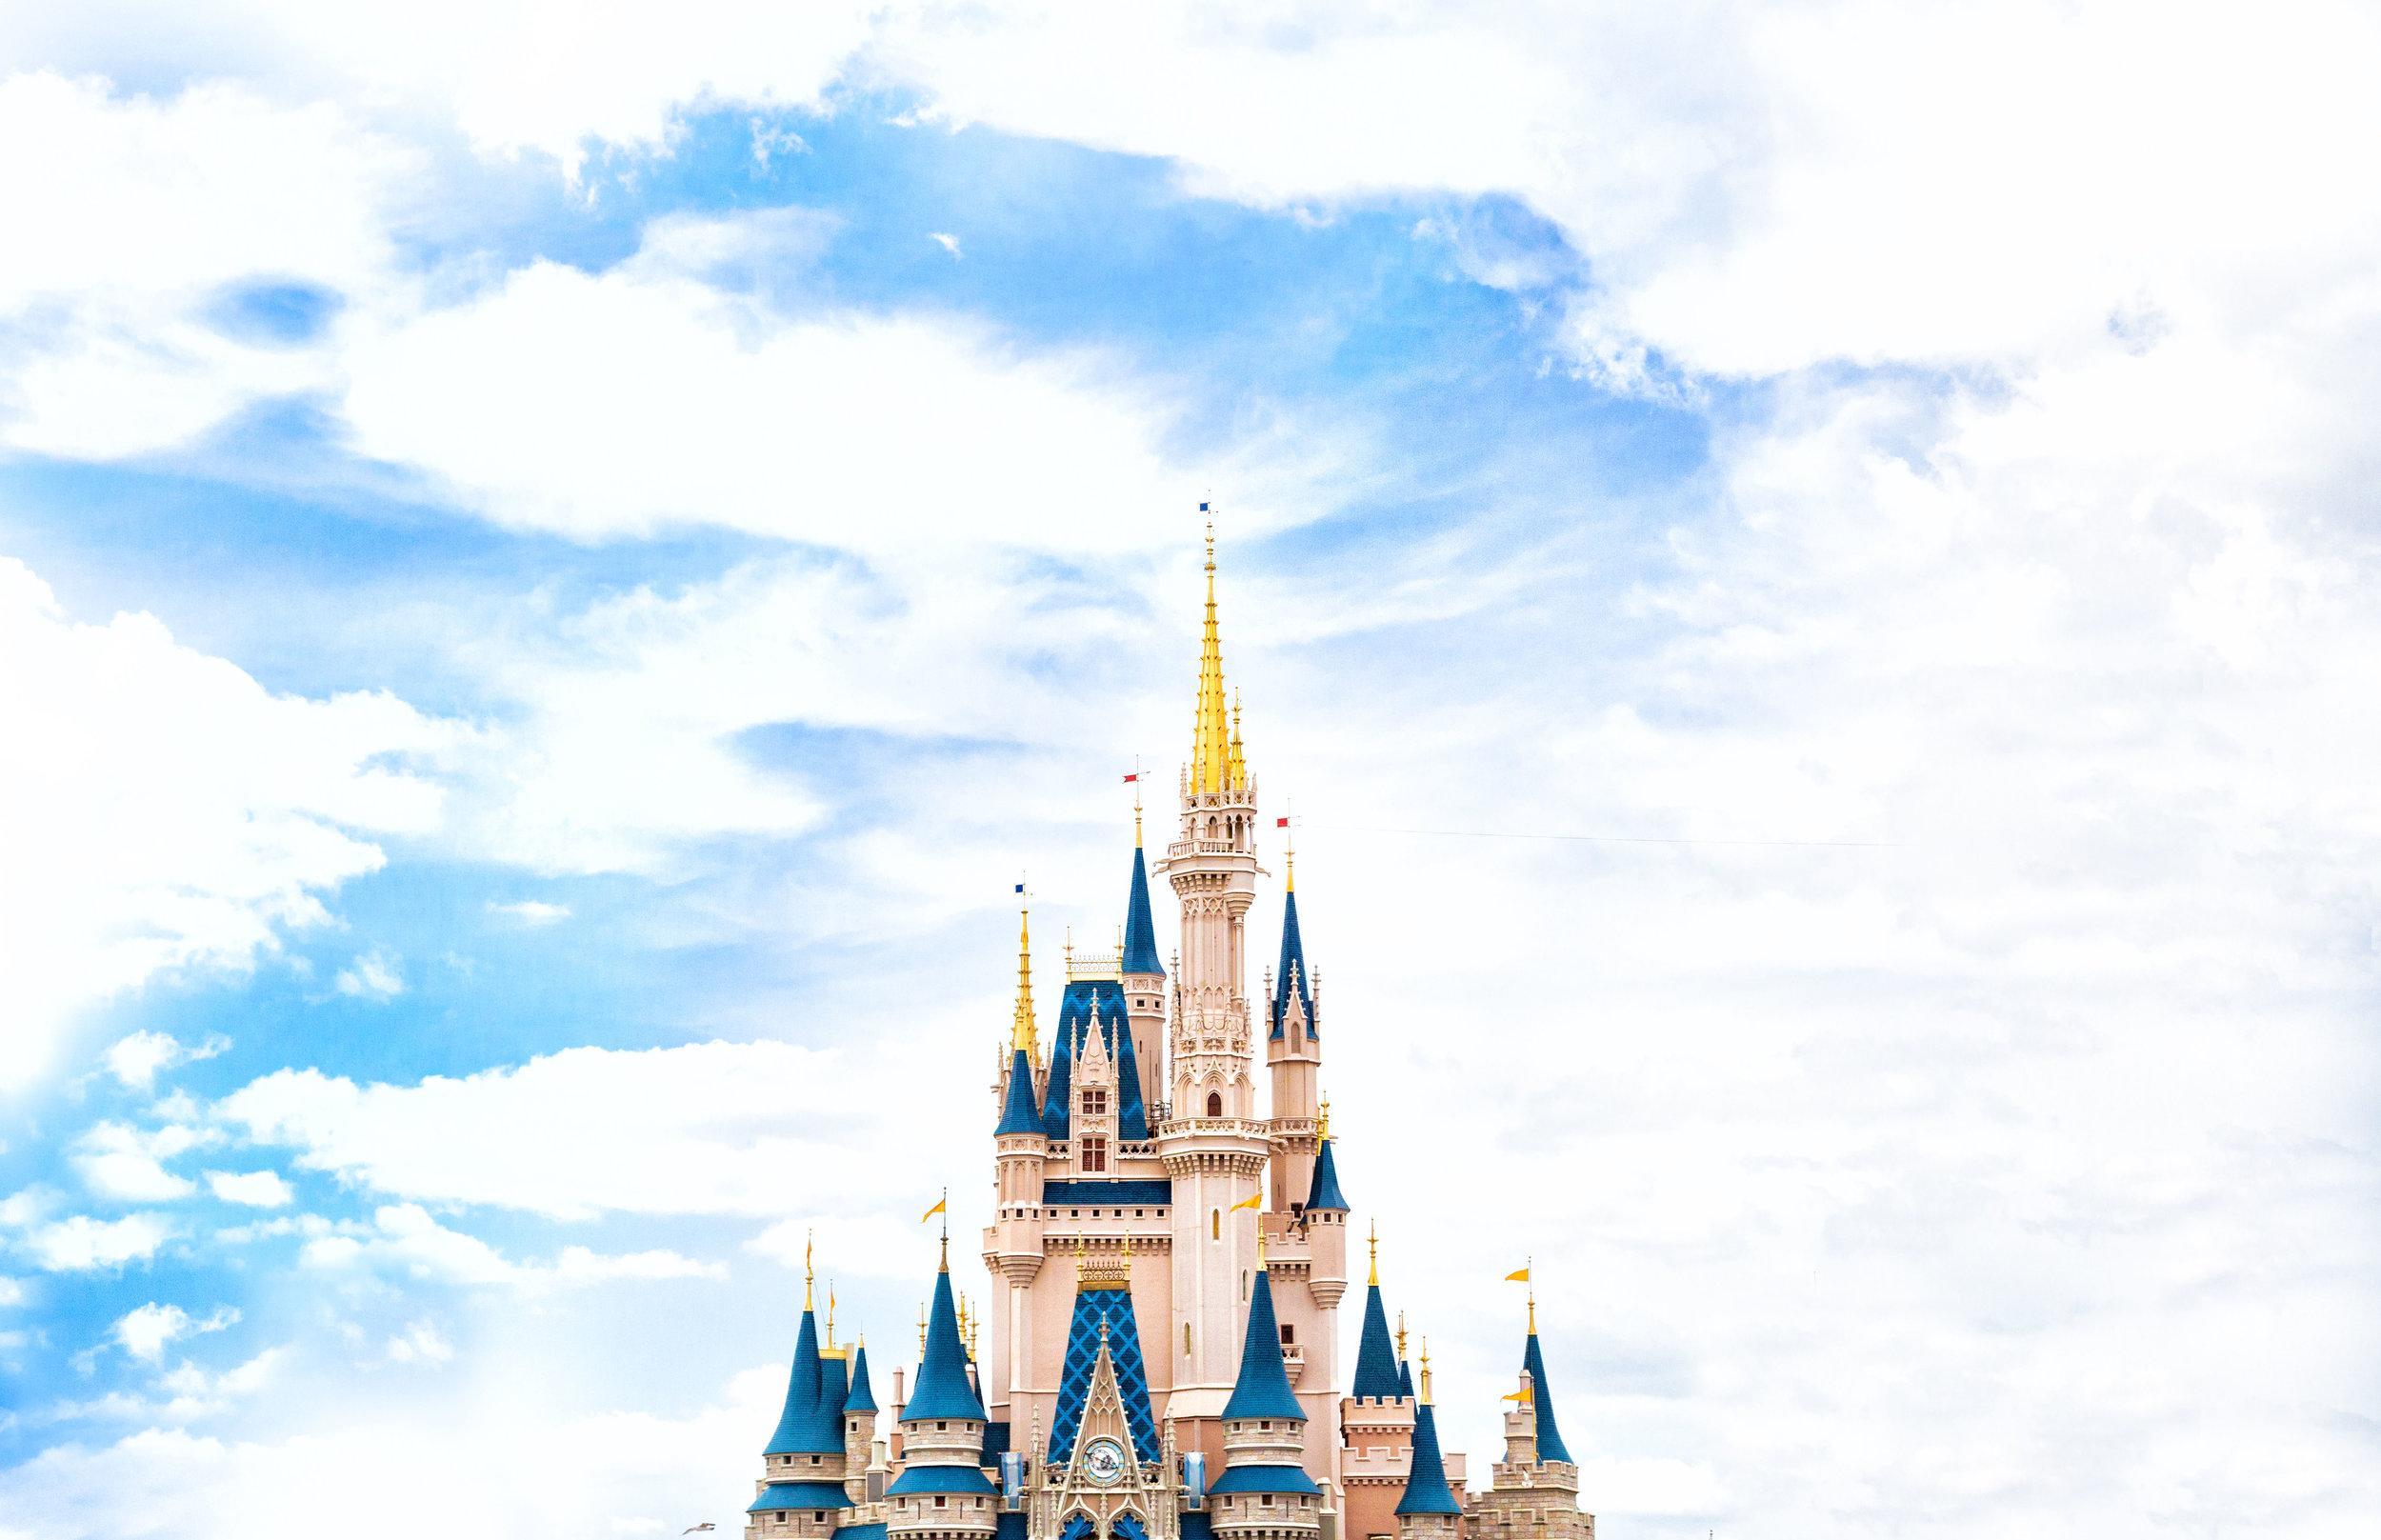 disney princess castle reduced.jpg